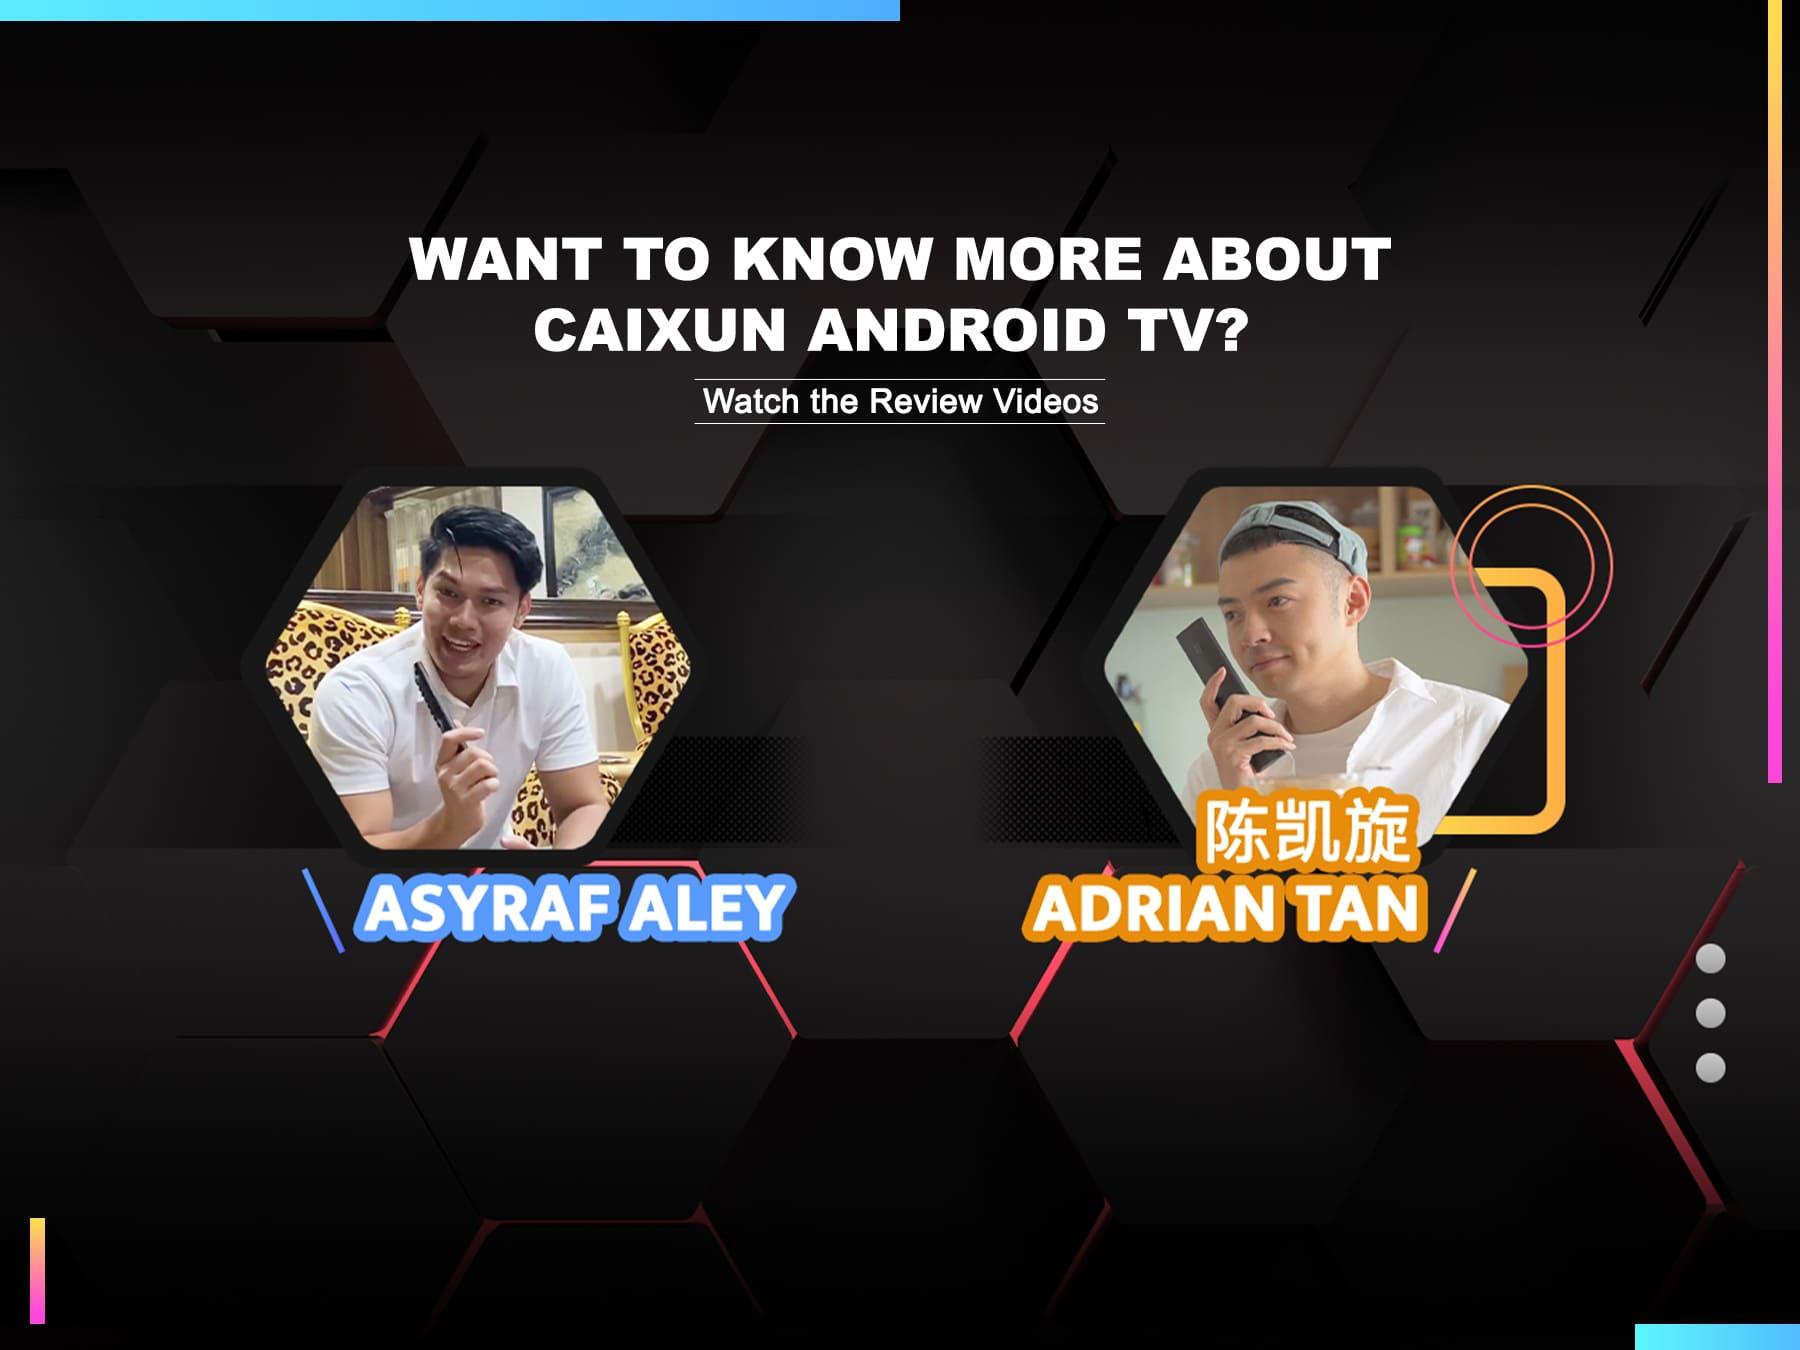 CAIXUN ANDROID TV REVIEW: ASYRAF ALEY & ADRIAN TAN